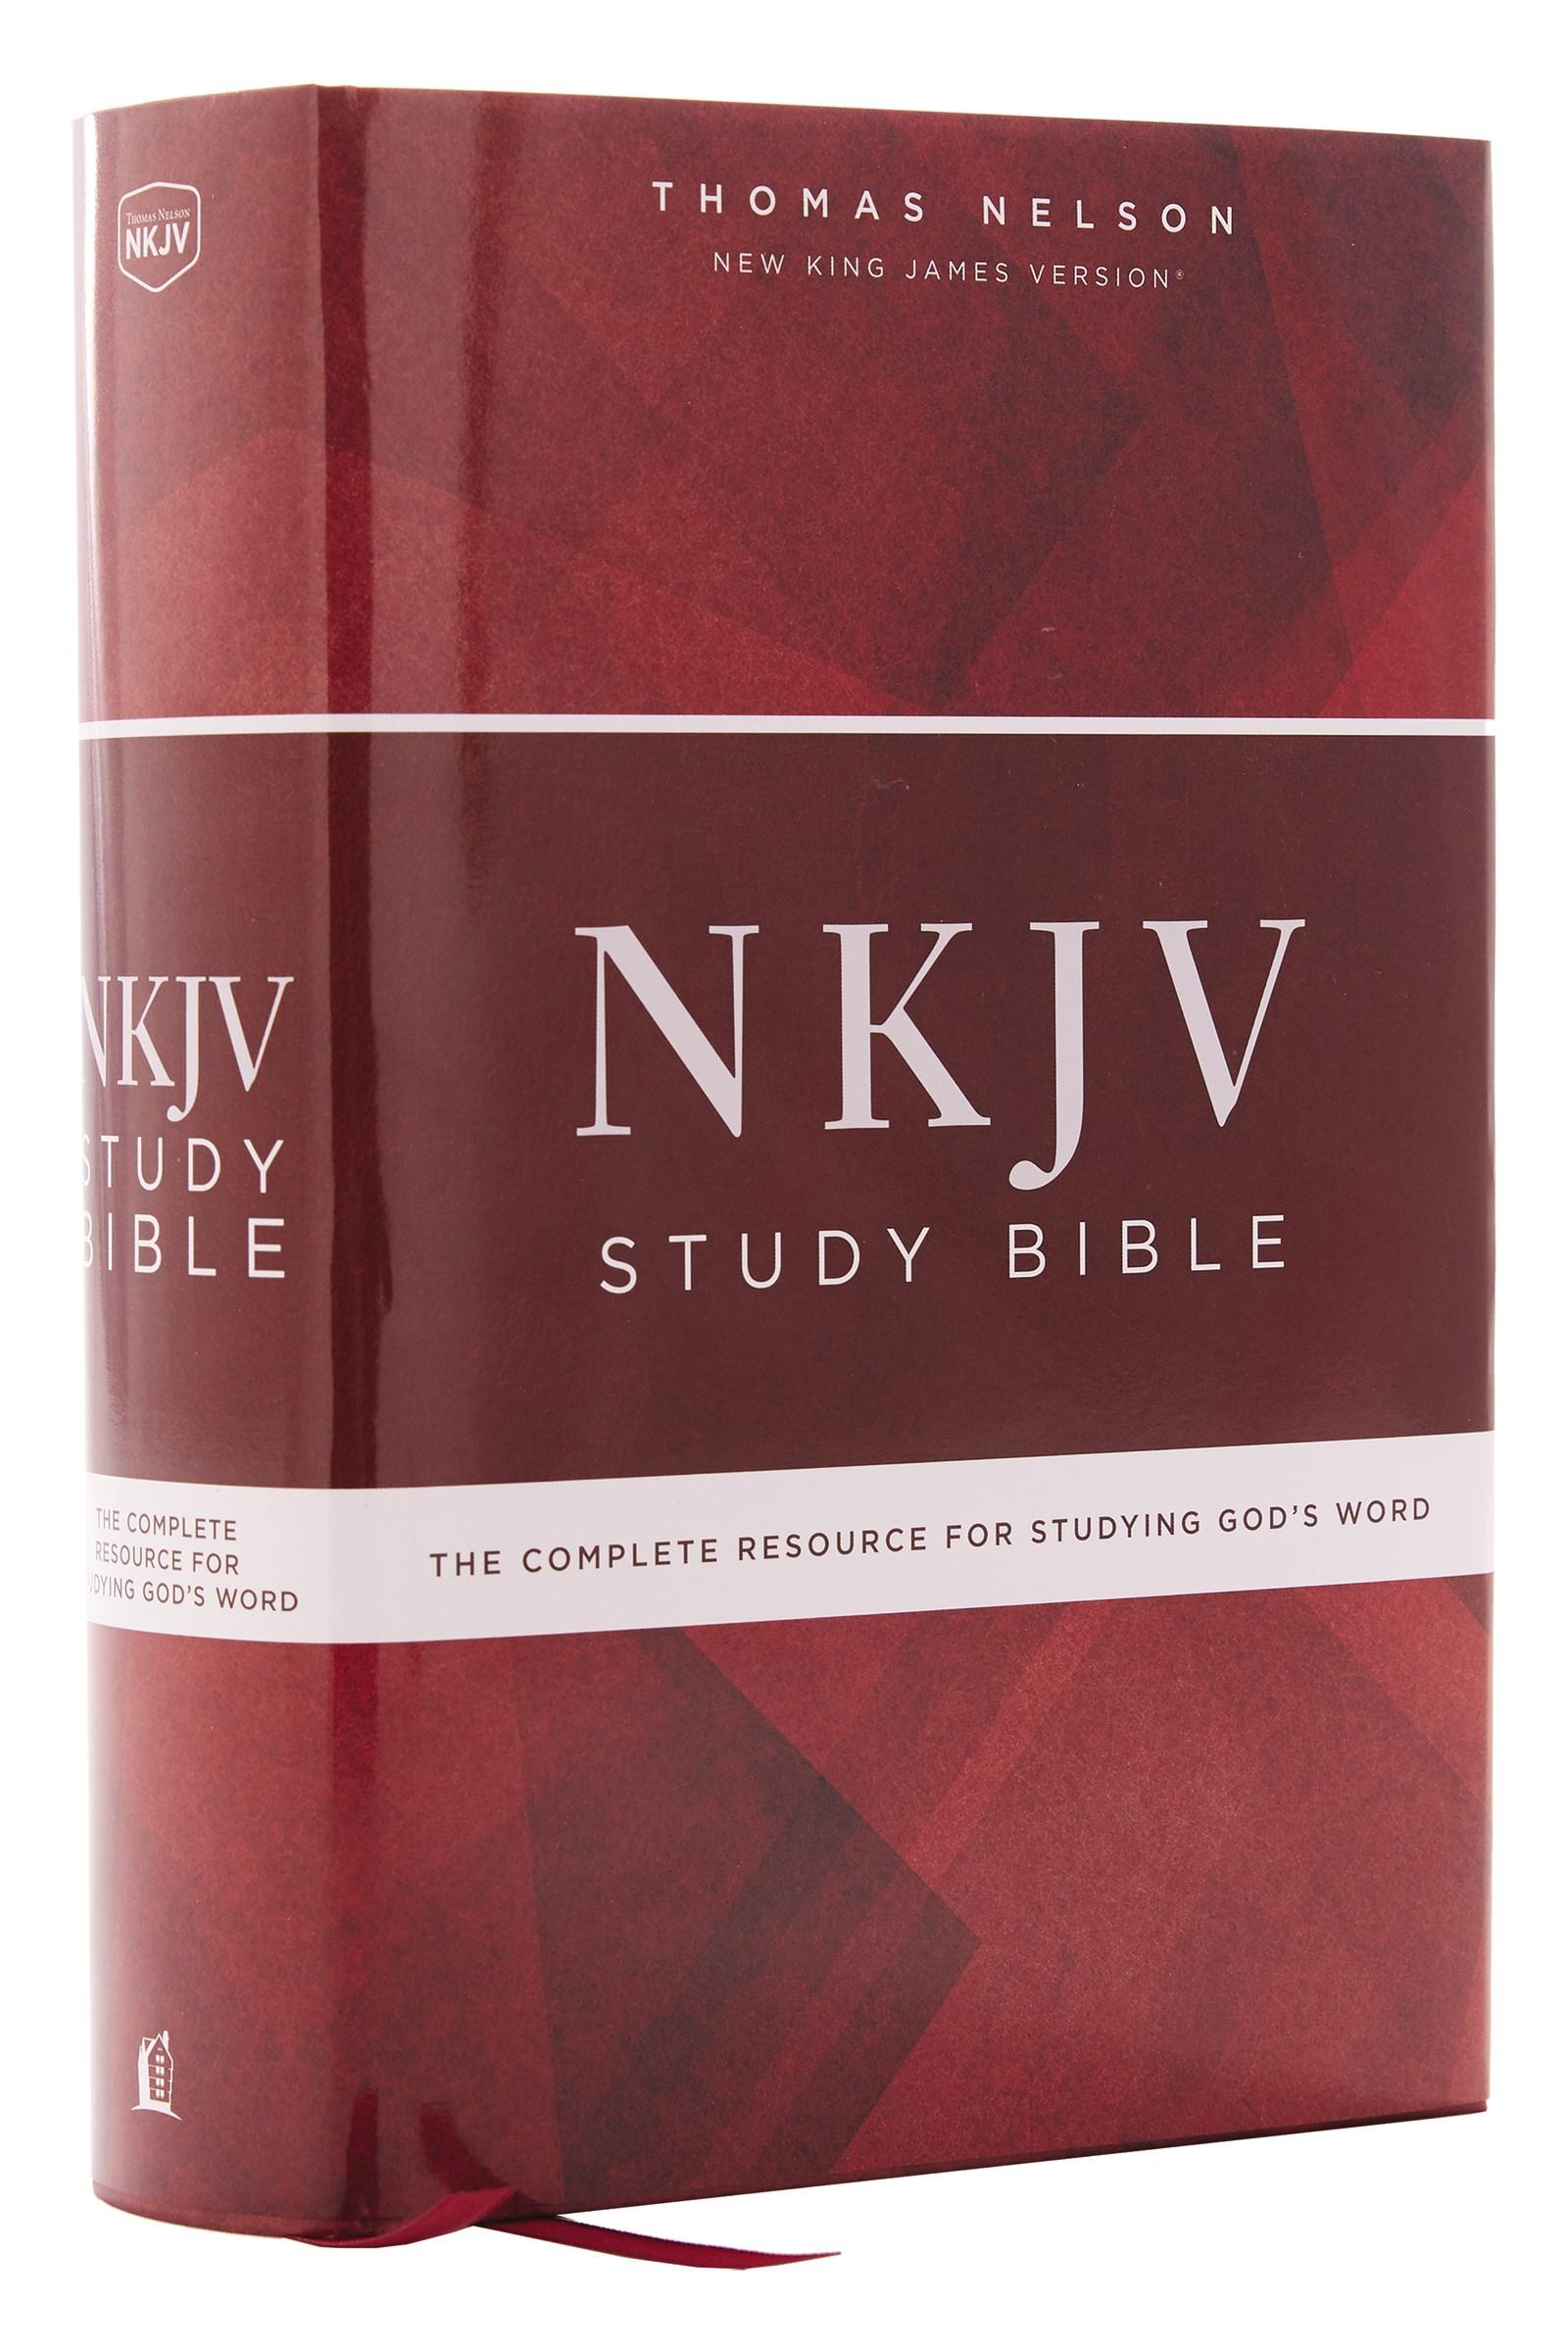 NKJV Study Bible (Comfort Print)-Hardcover